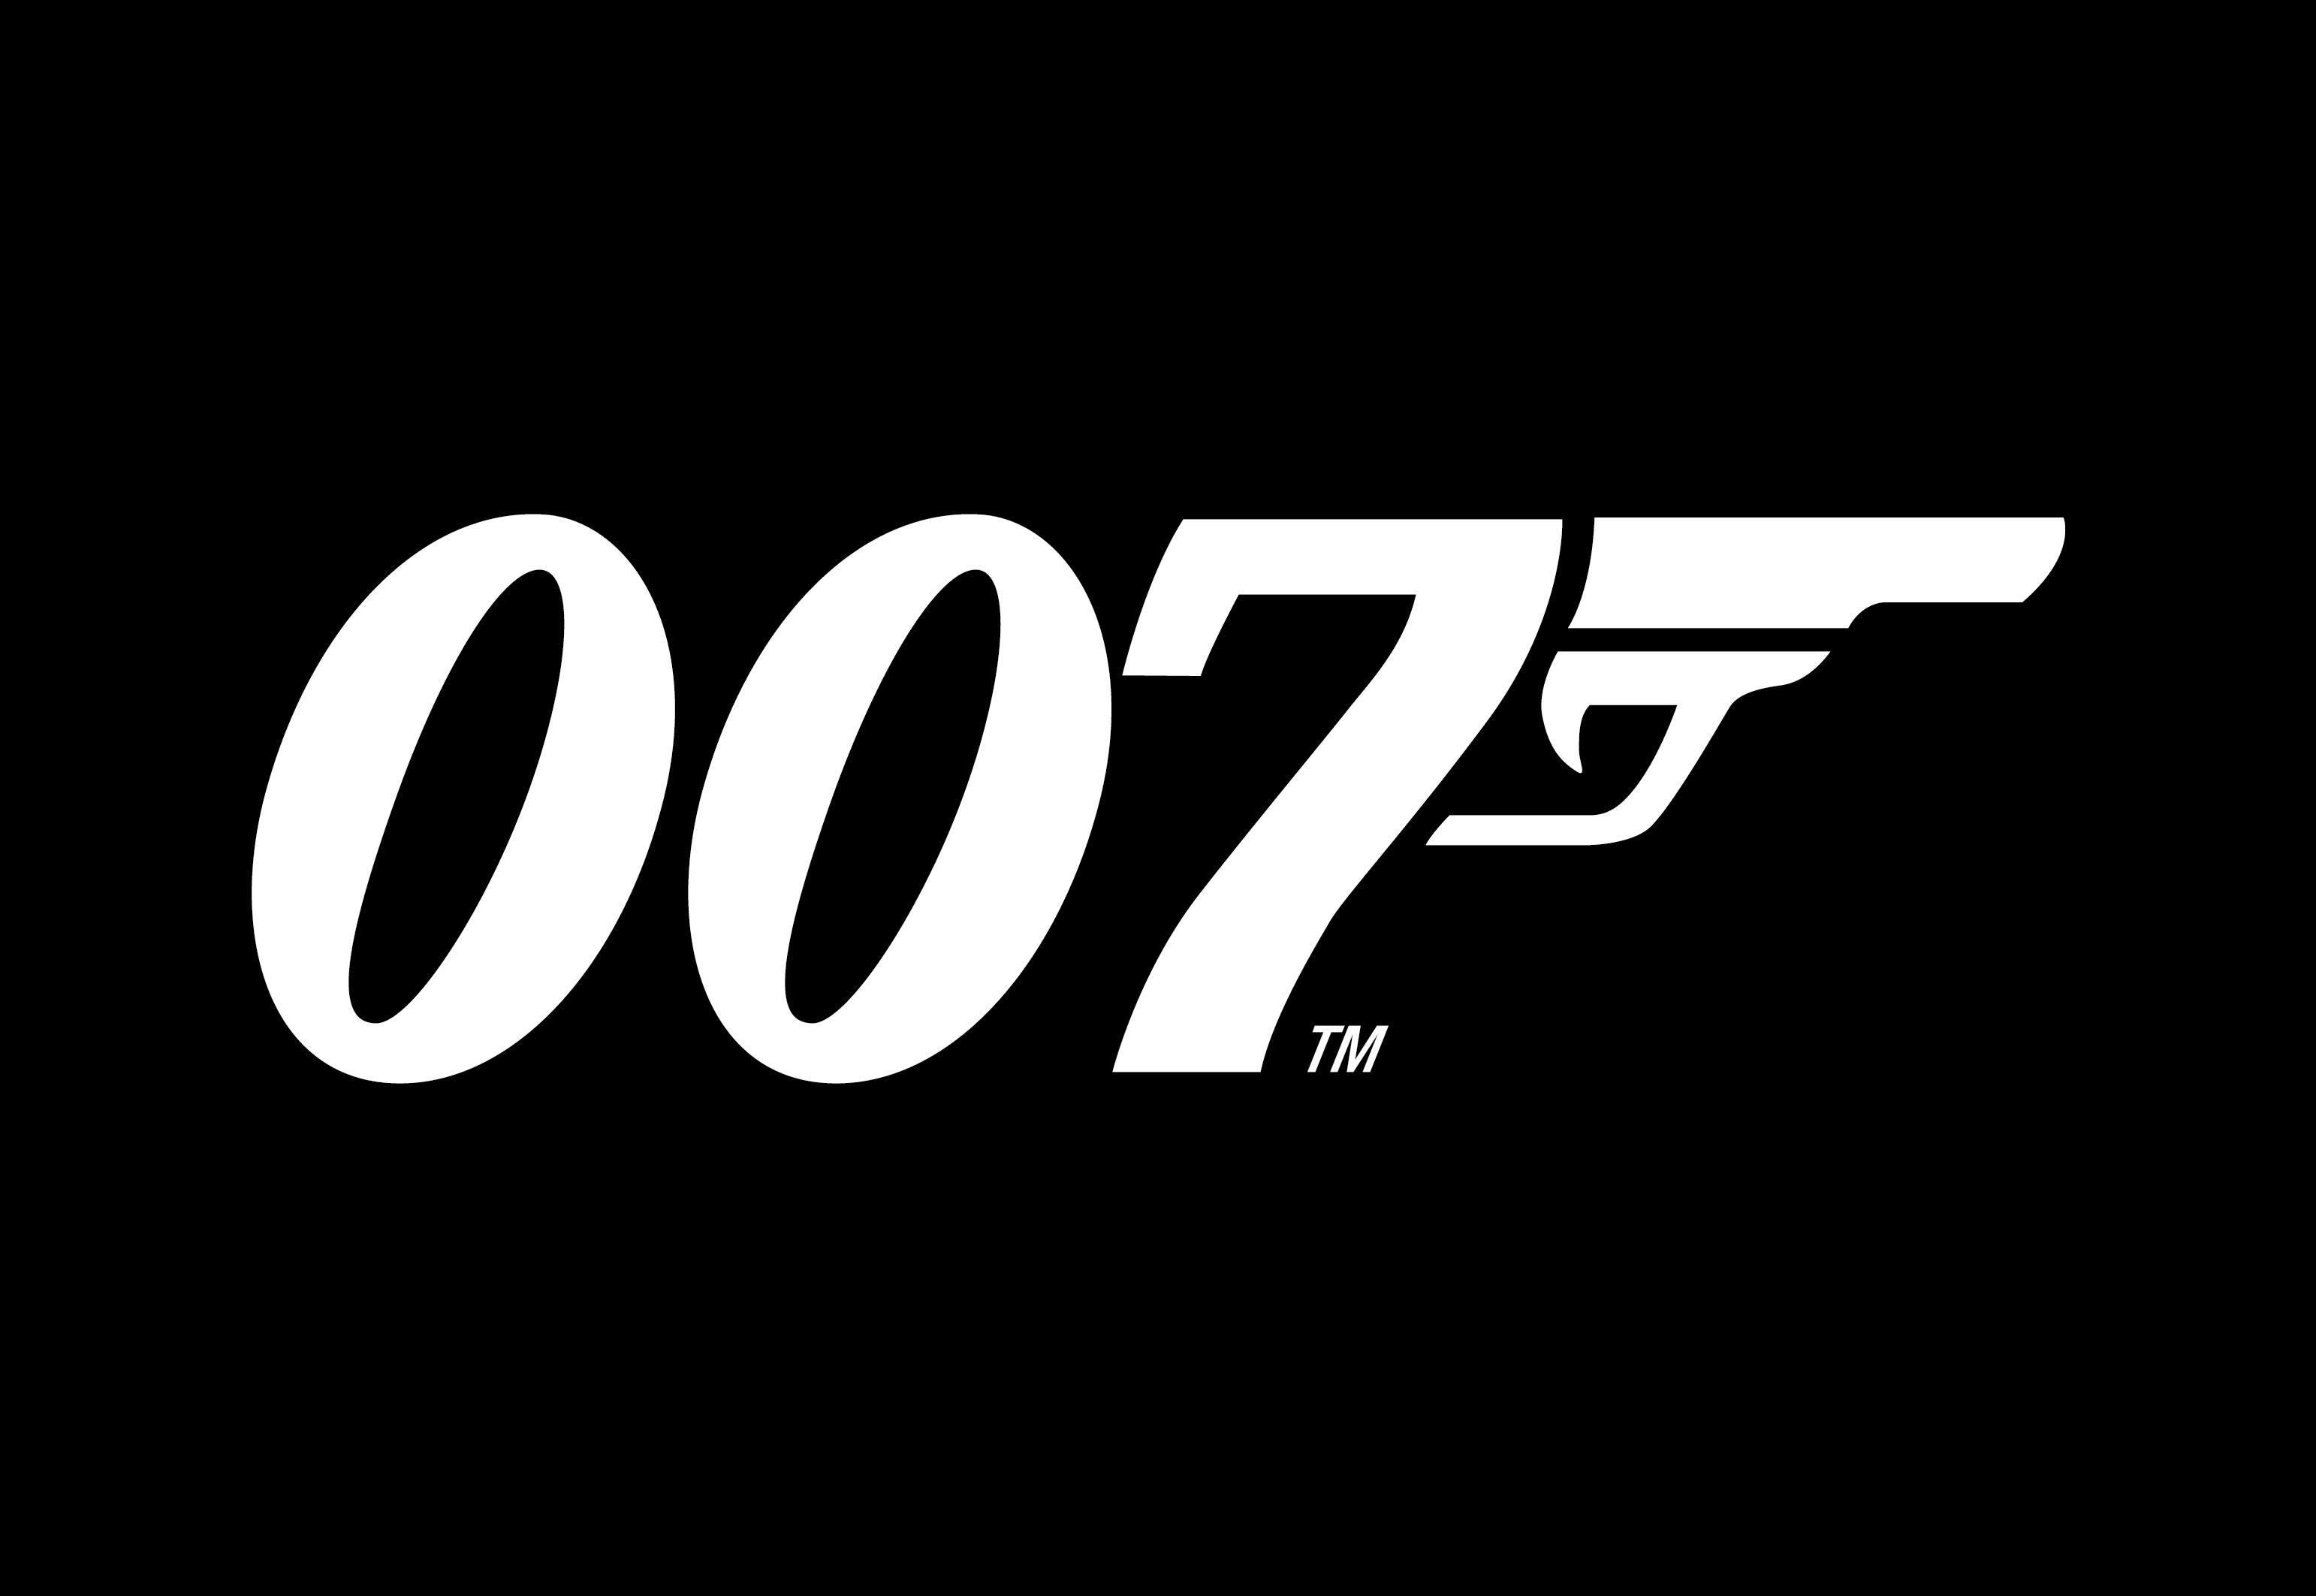 007 Logo James Bond New James Bond 007 James Bond